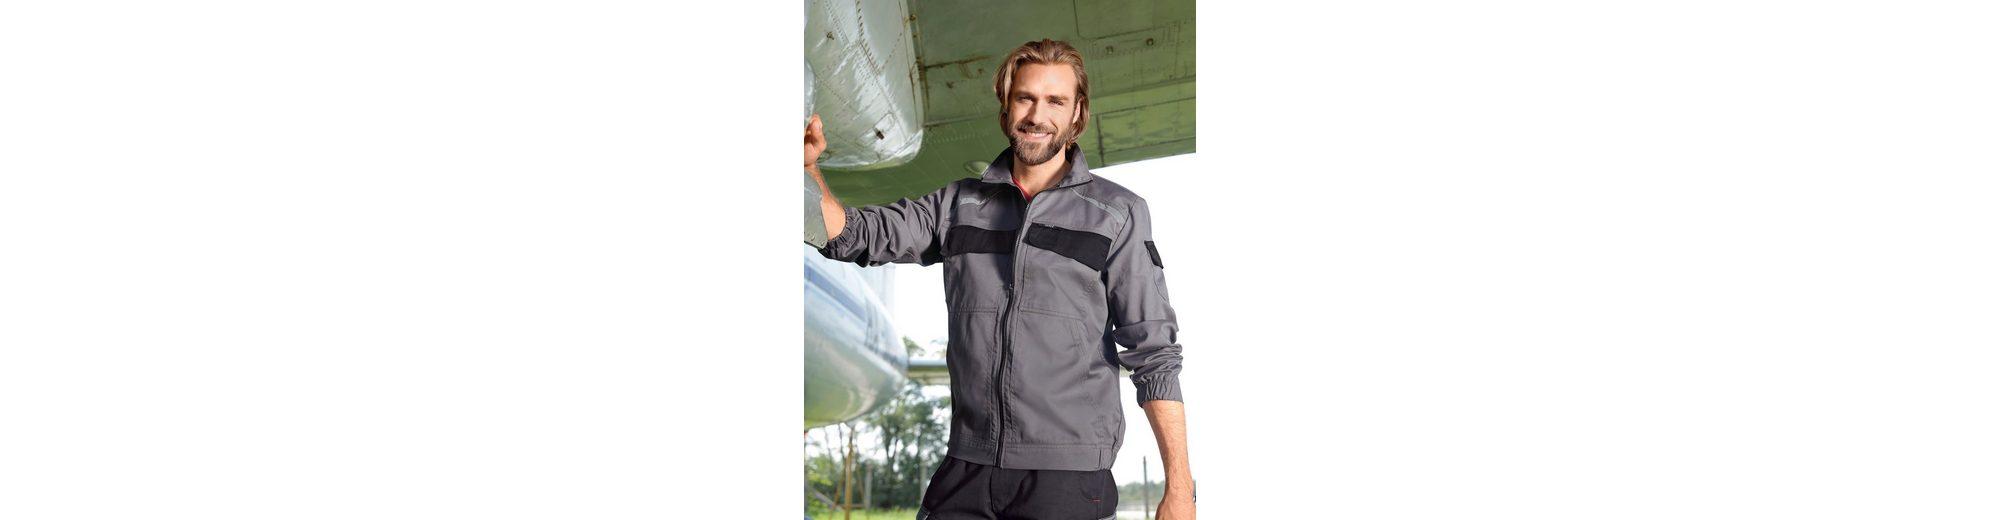 Men Plus by Happy Size Arbeitsjacke Günstig Kaufen Besten Großhandel Billig Bestseller eWgaNLywWY